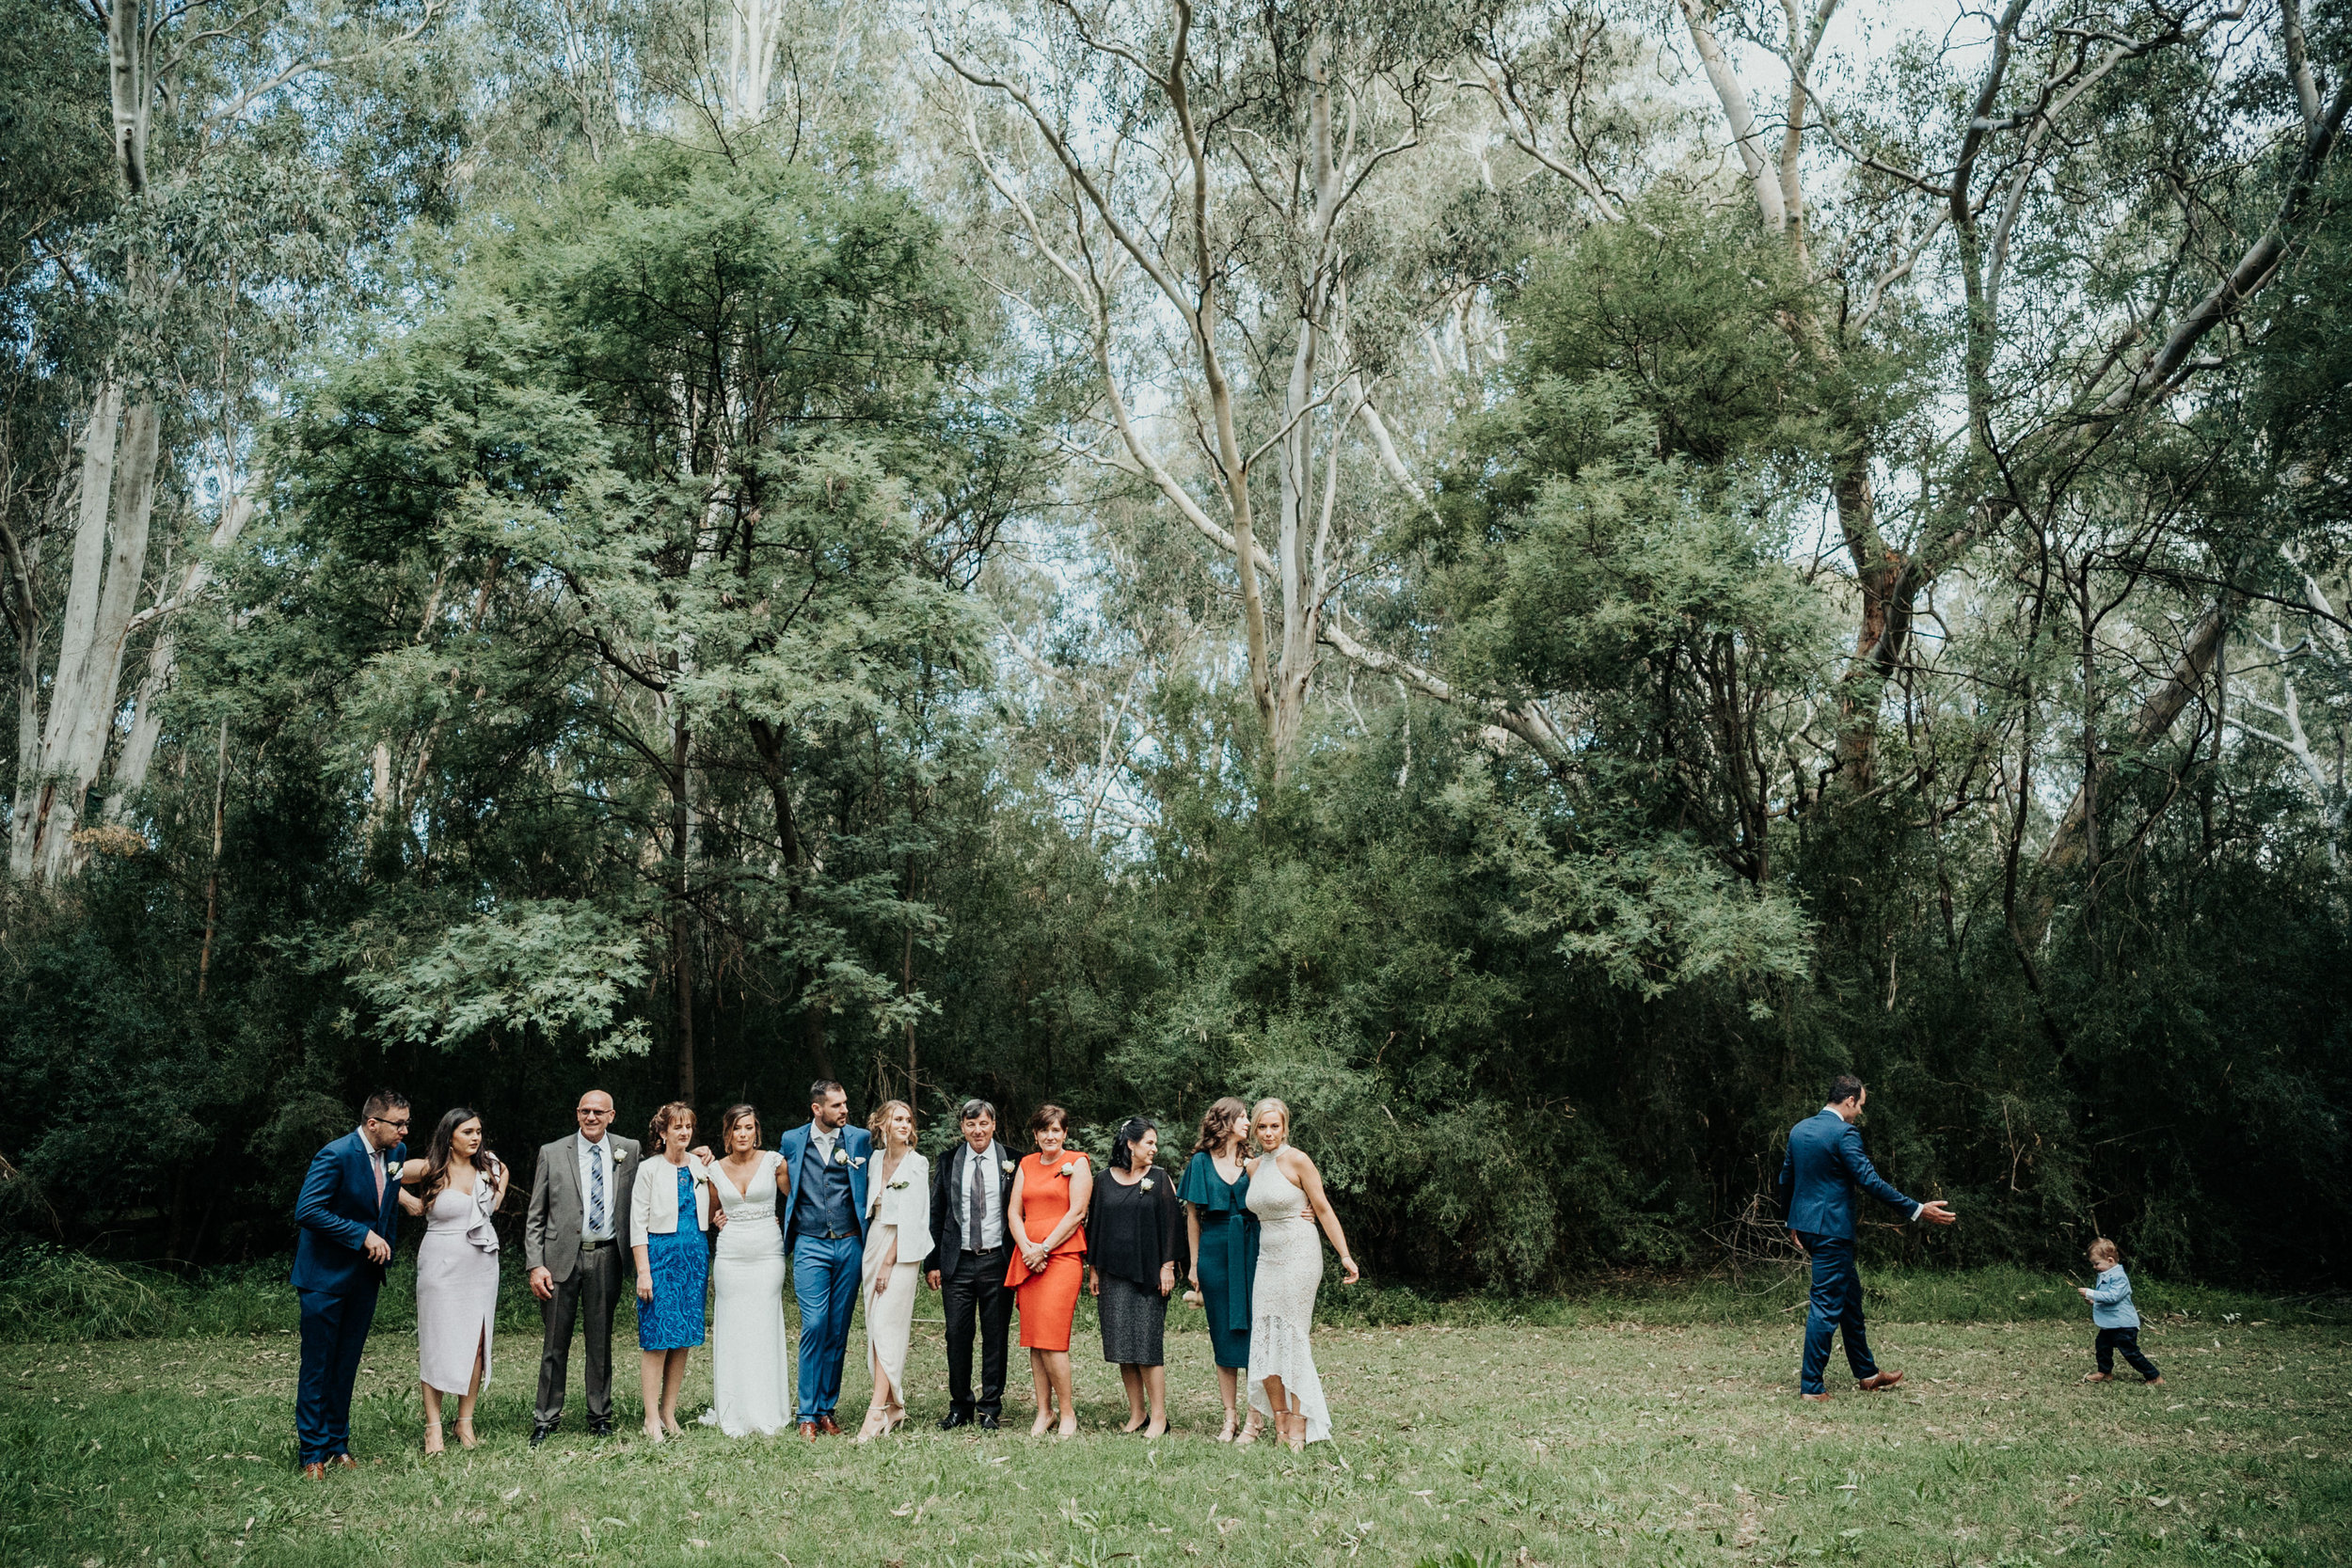 Aleksandra-Mladen-Wedding-Andy-343.jpg